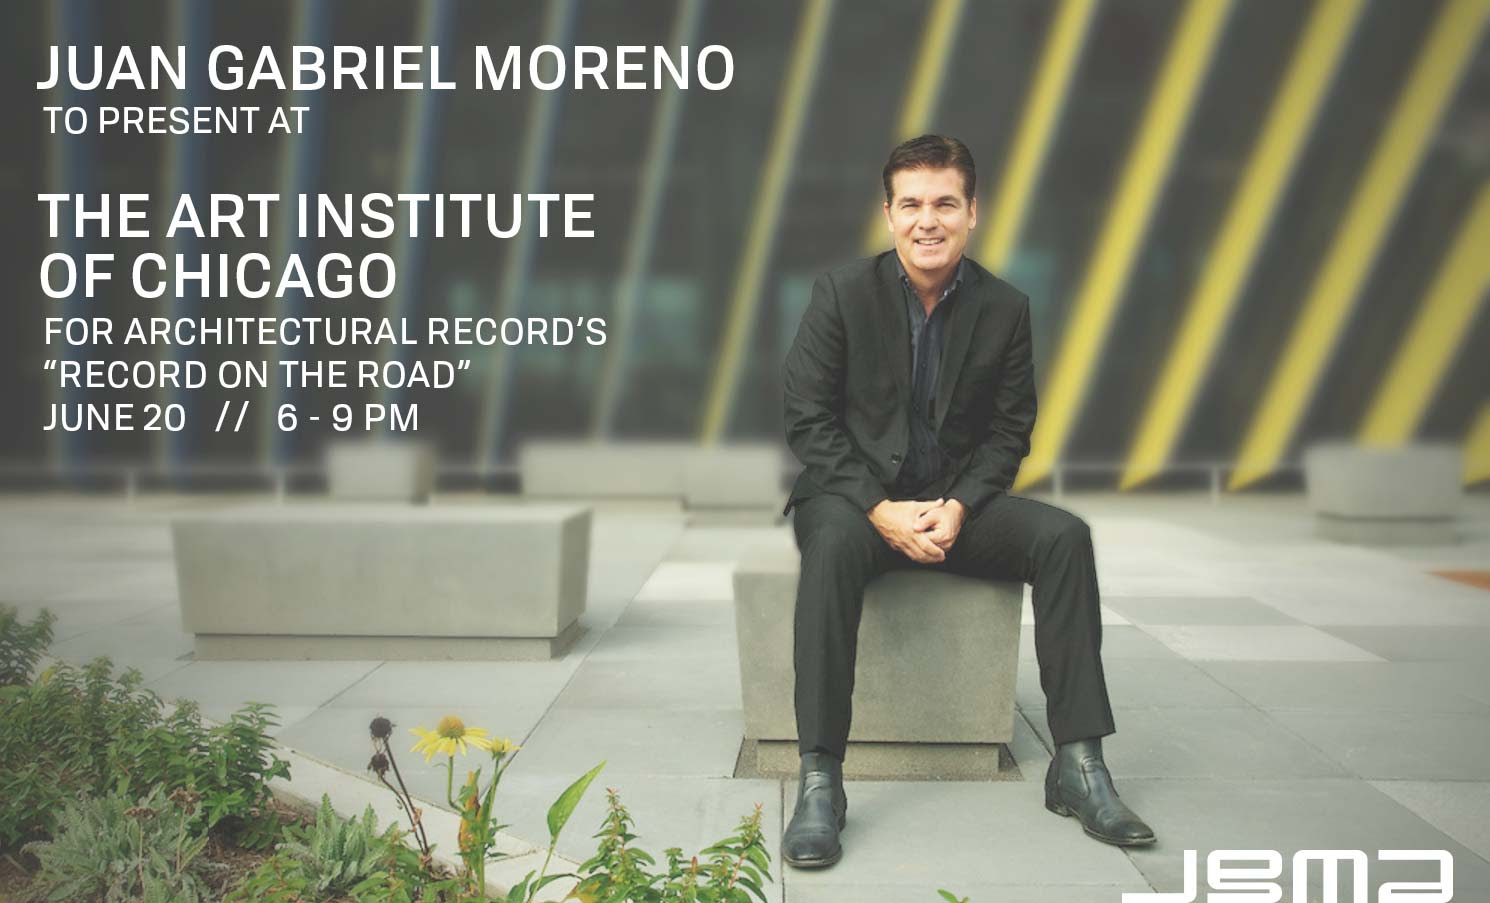 Juan Gabriel Moreno